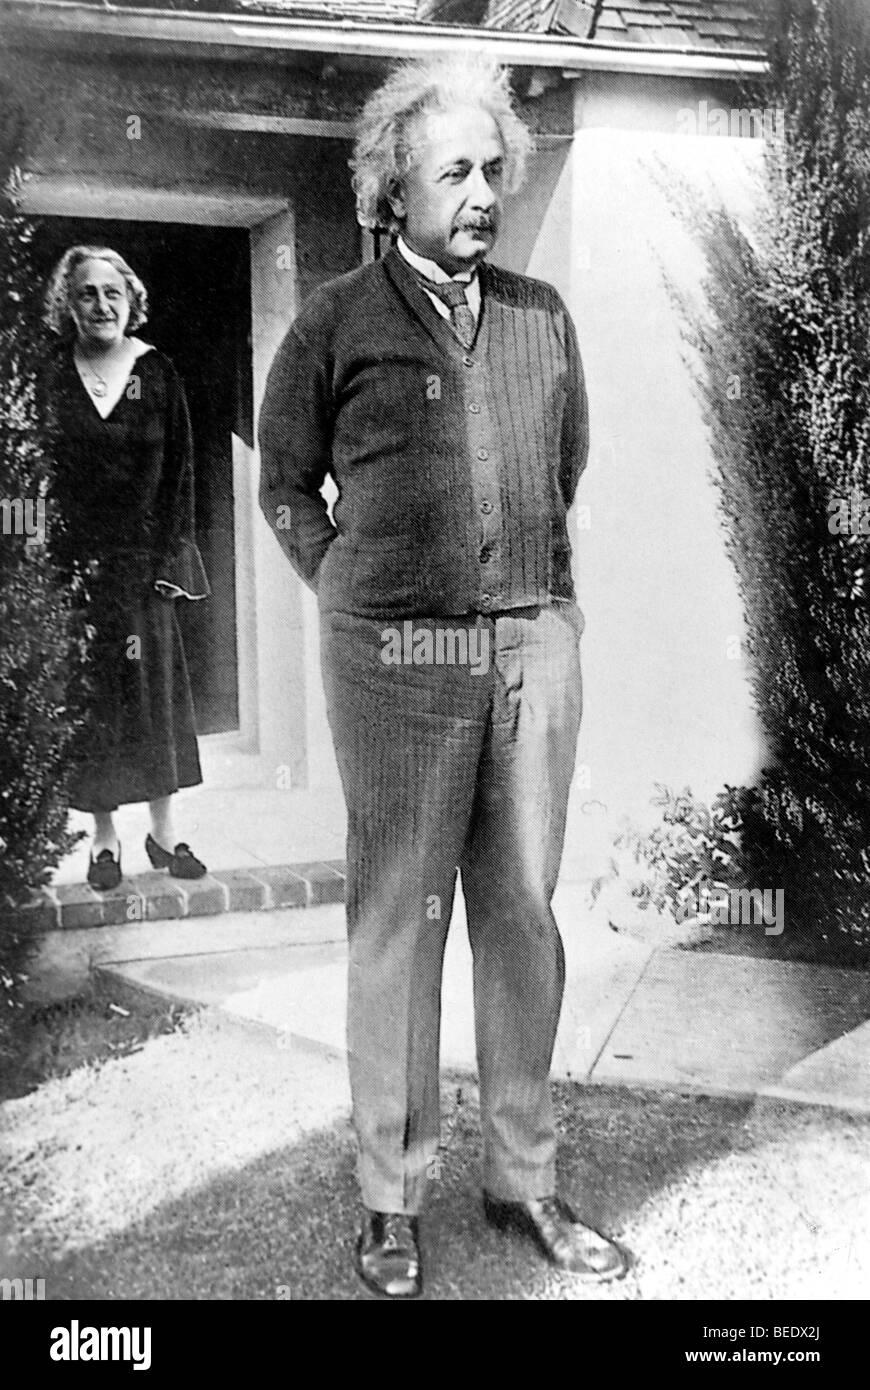 Albert Einstein with his wife Elsa - Stock Image